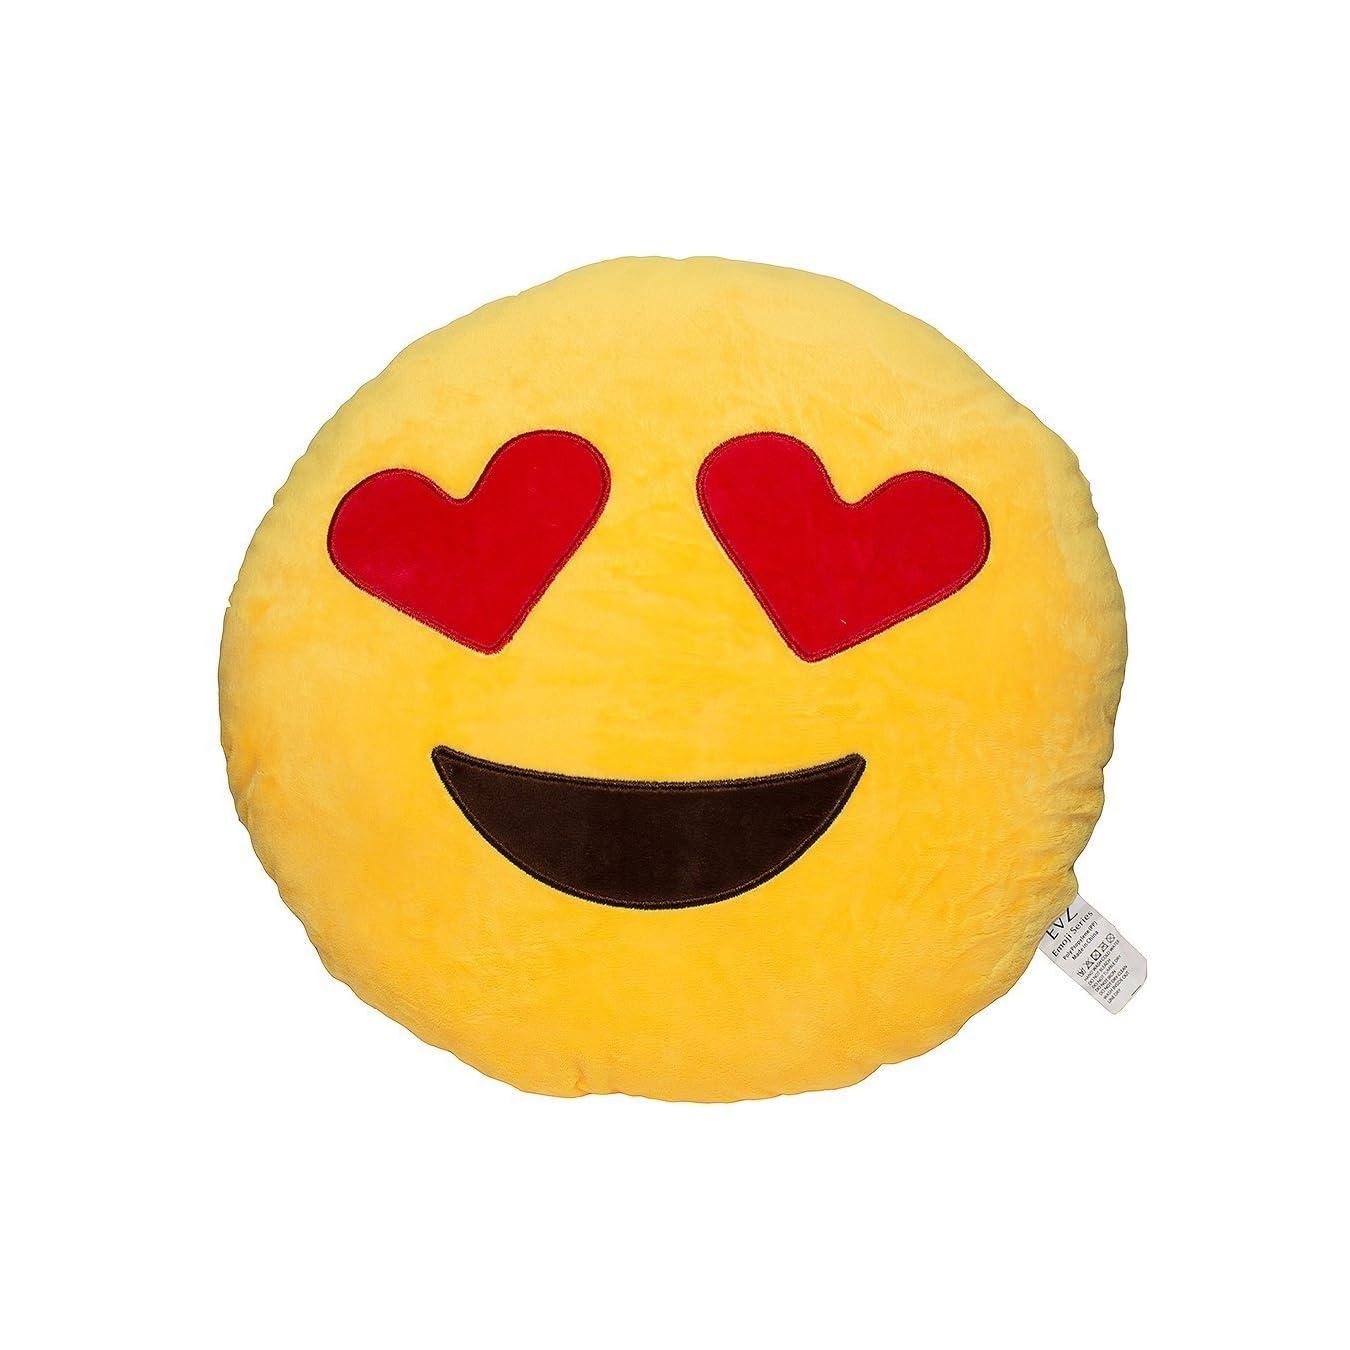 ead6a2ac ... Hasaker Emoji Pillow Set Emoticon Pillow 12.5 Inch Pillows Cushion  Stuffed Plush Soft Pillow Toy Round